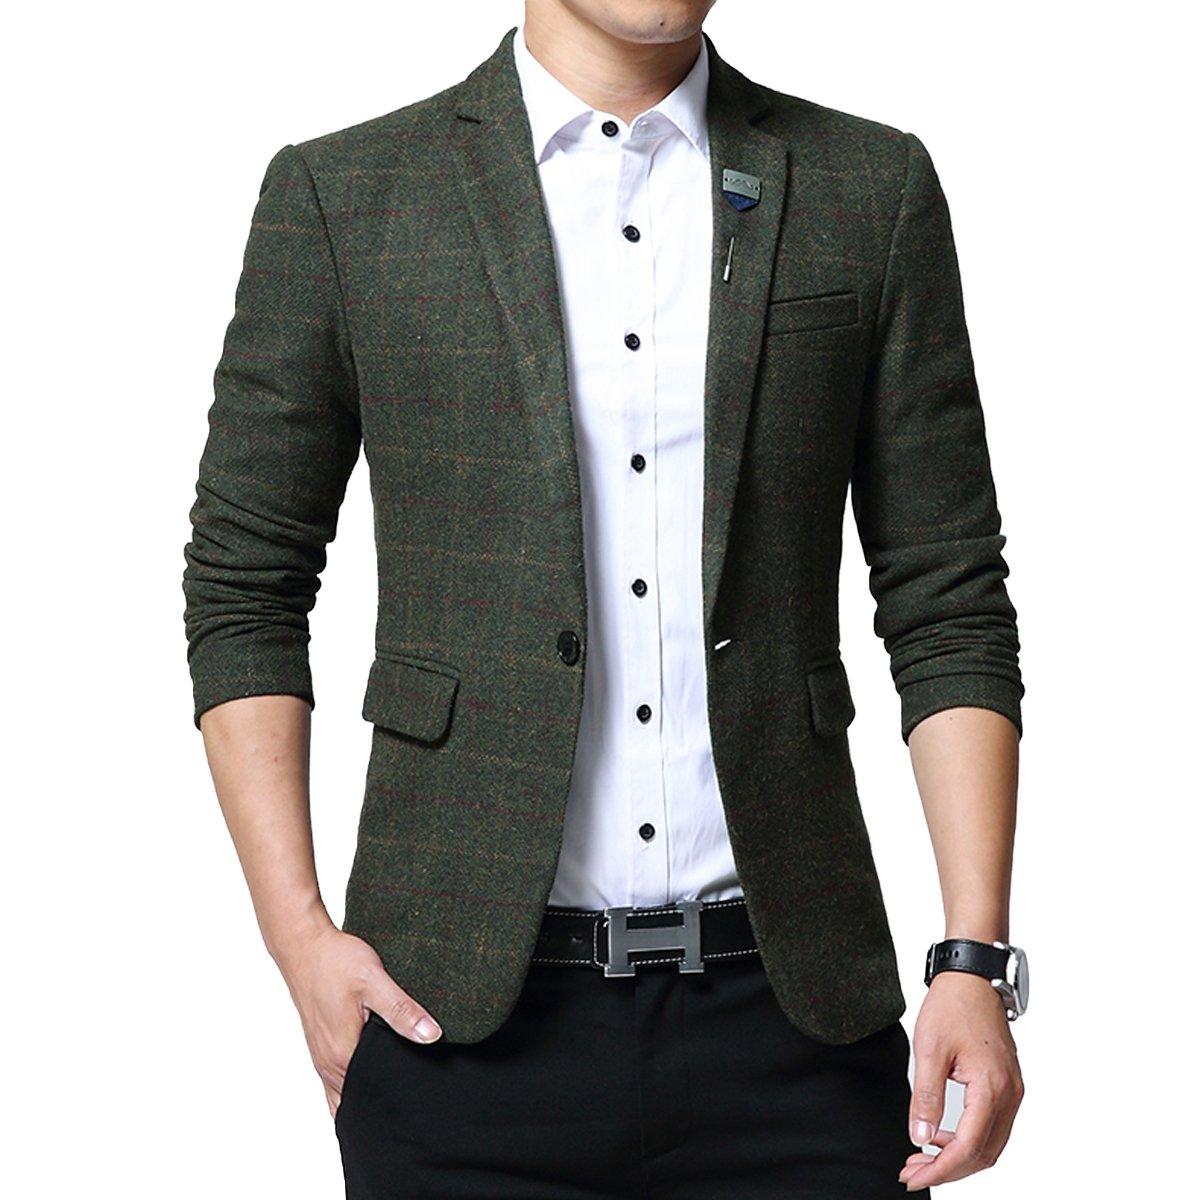 INVACHI Mens Fashionable Slim Fit Casual Tweed Jacket Wedding Prom Party Checkered Blazer Jacket